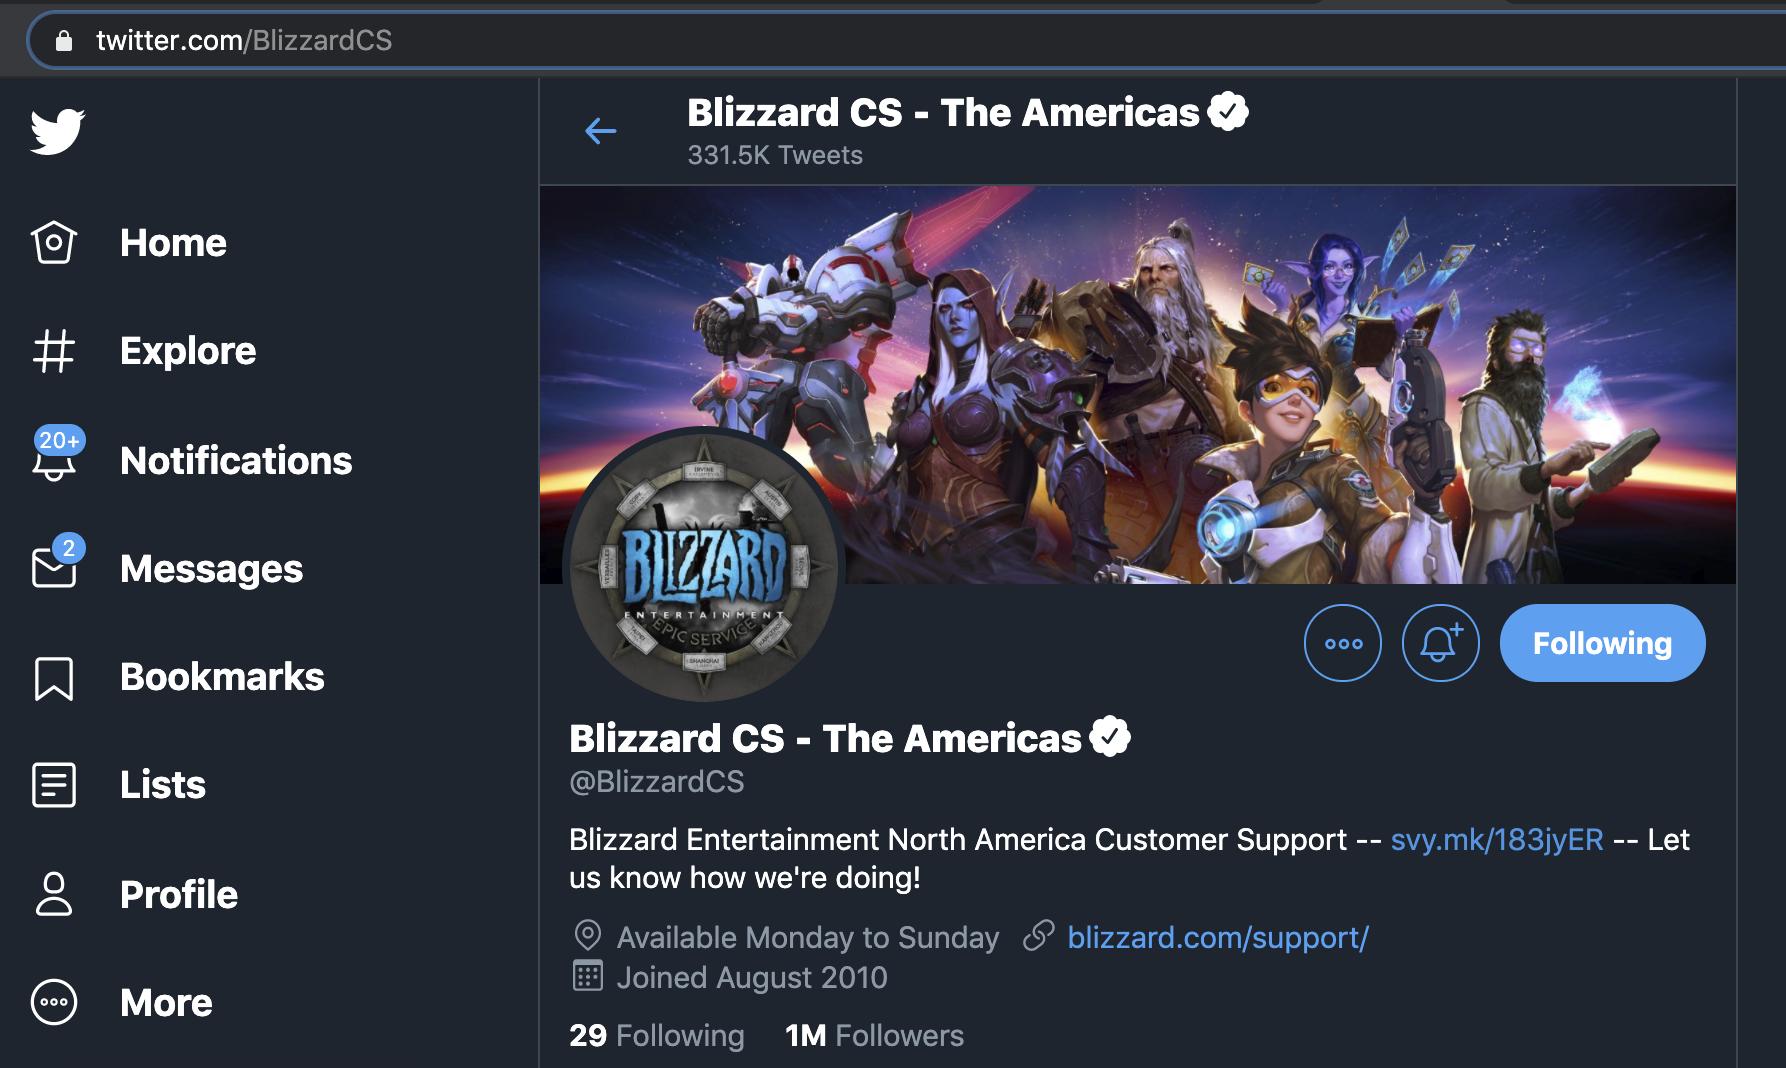 @BlizzardCS Twitter